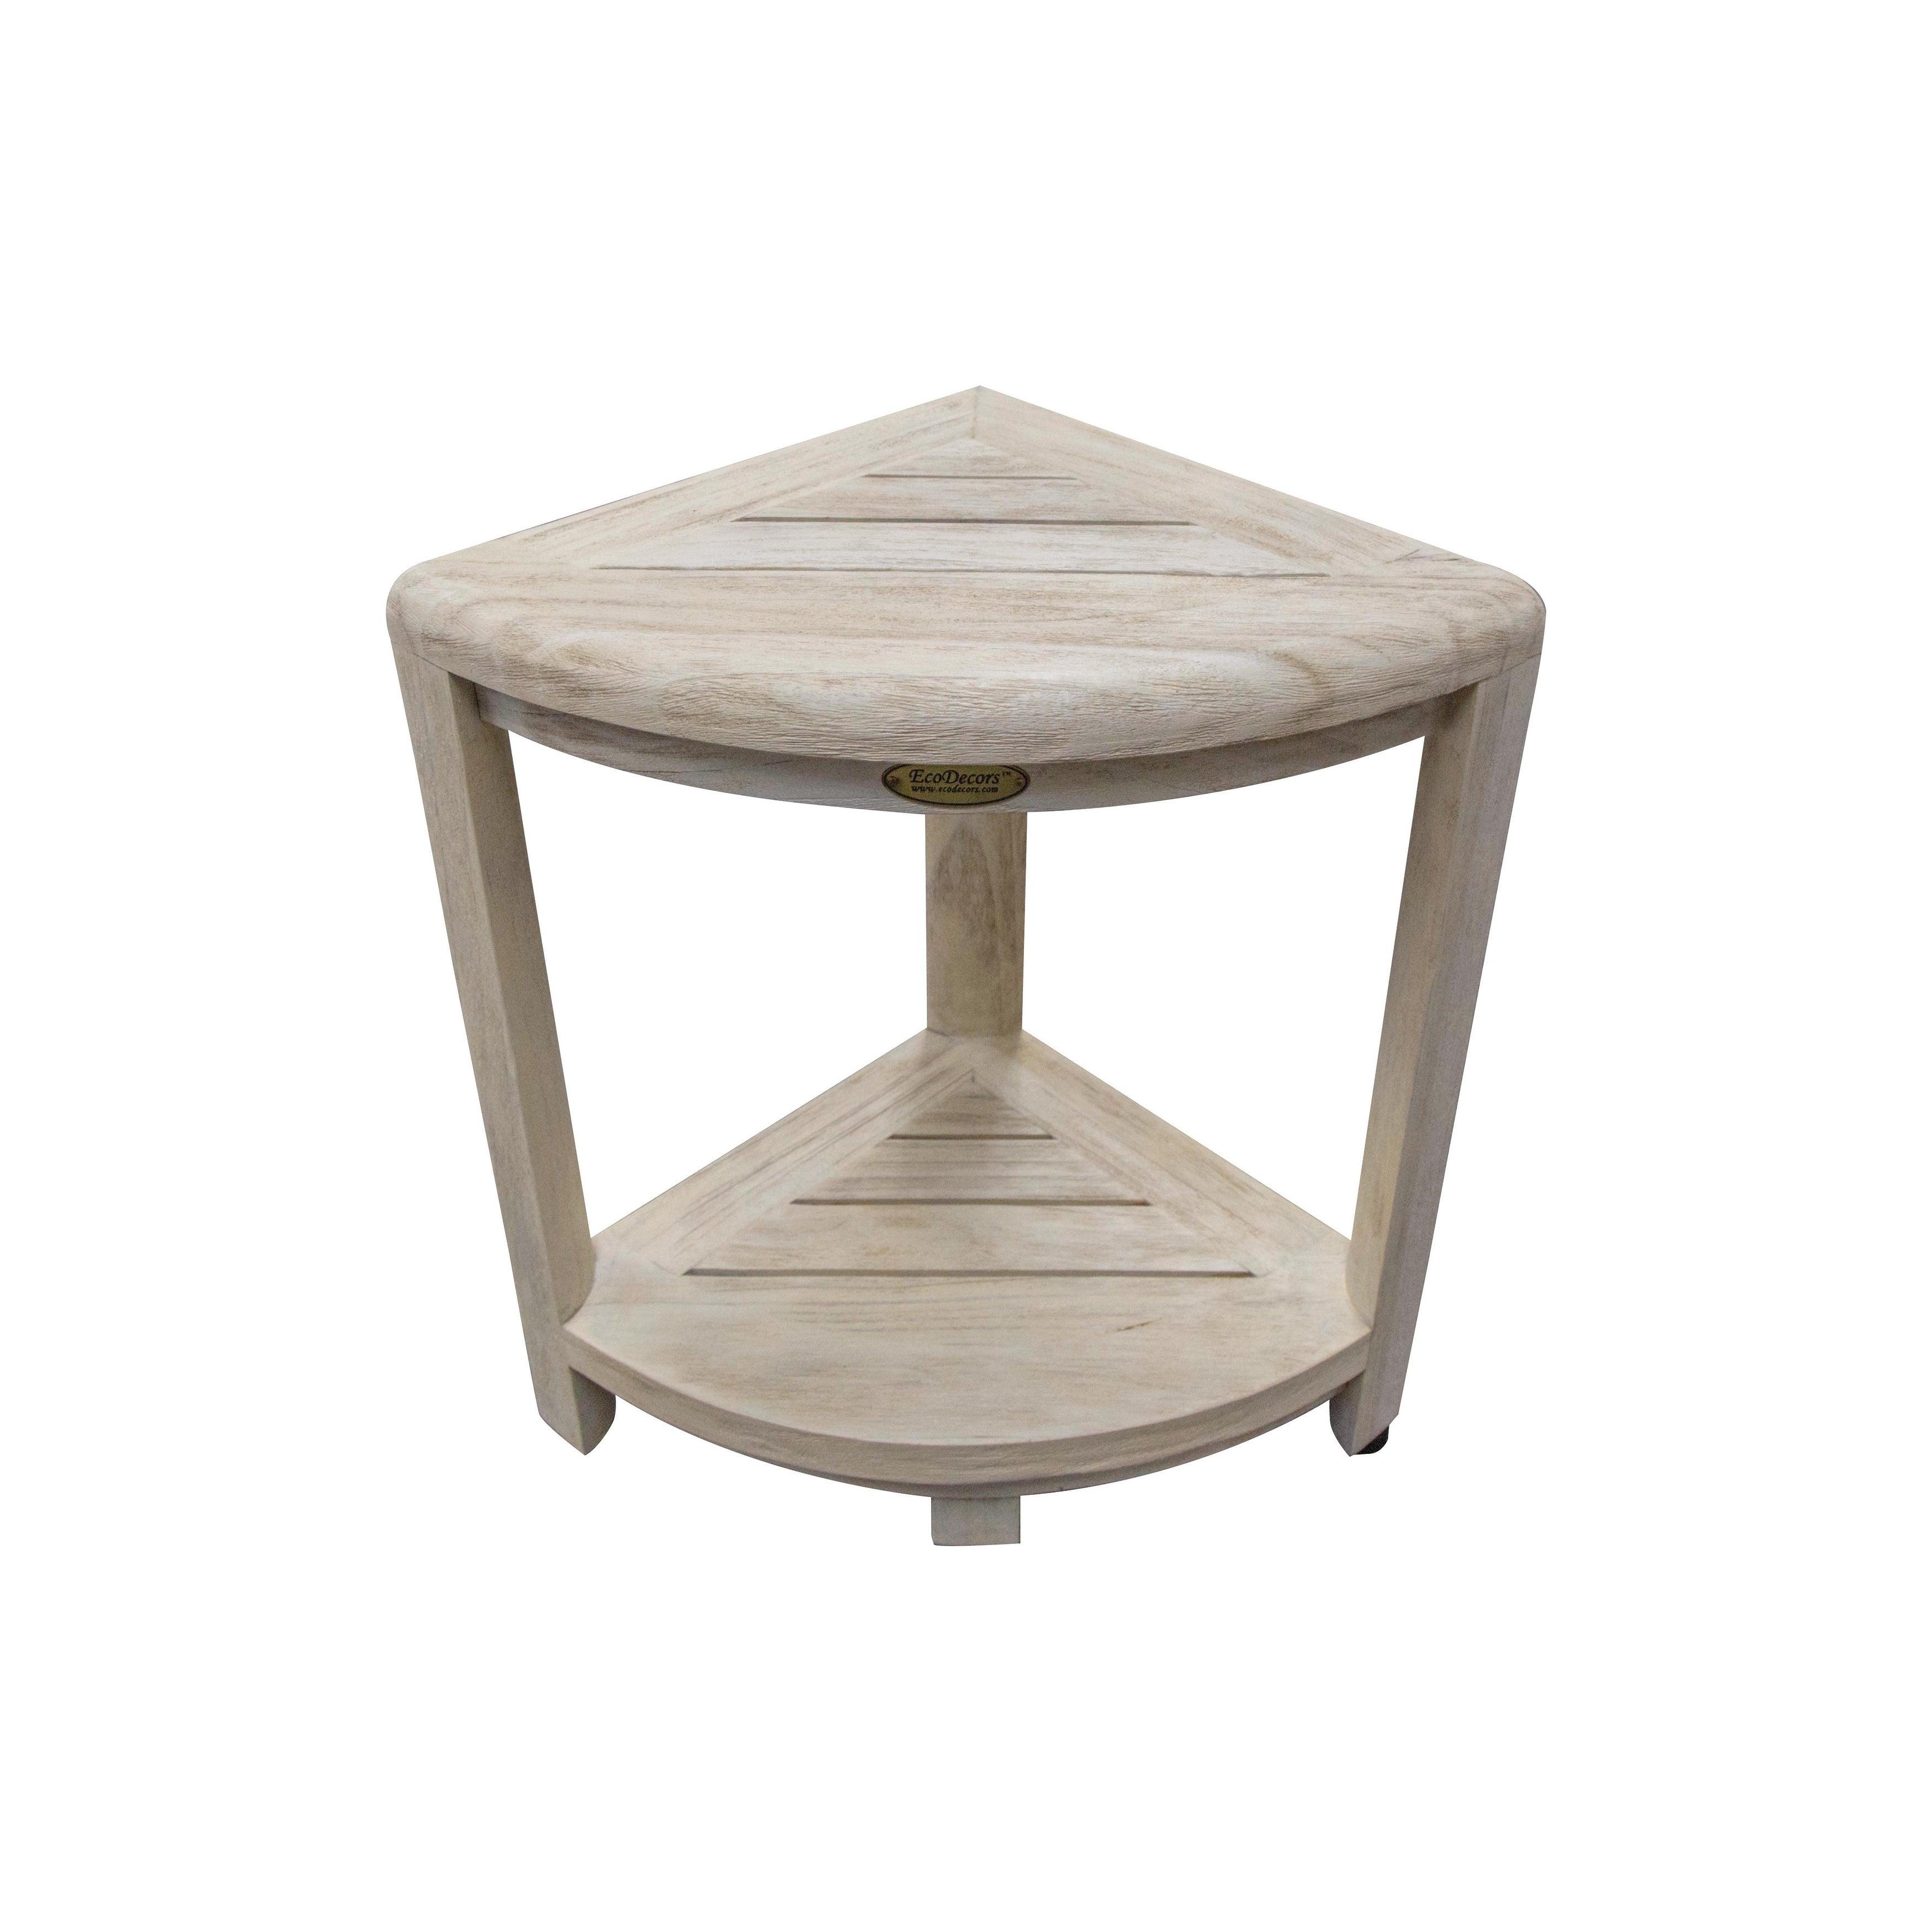 Corner Teak Shower Bench Coastalvogue Oasis 2 Tier With Storage Shelf Coastal Driftwood Finish Overstock 28301041